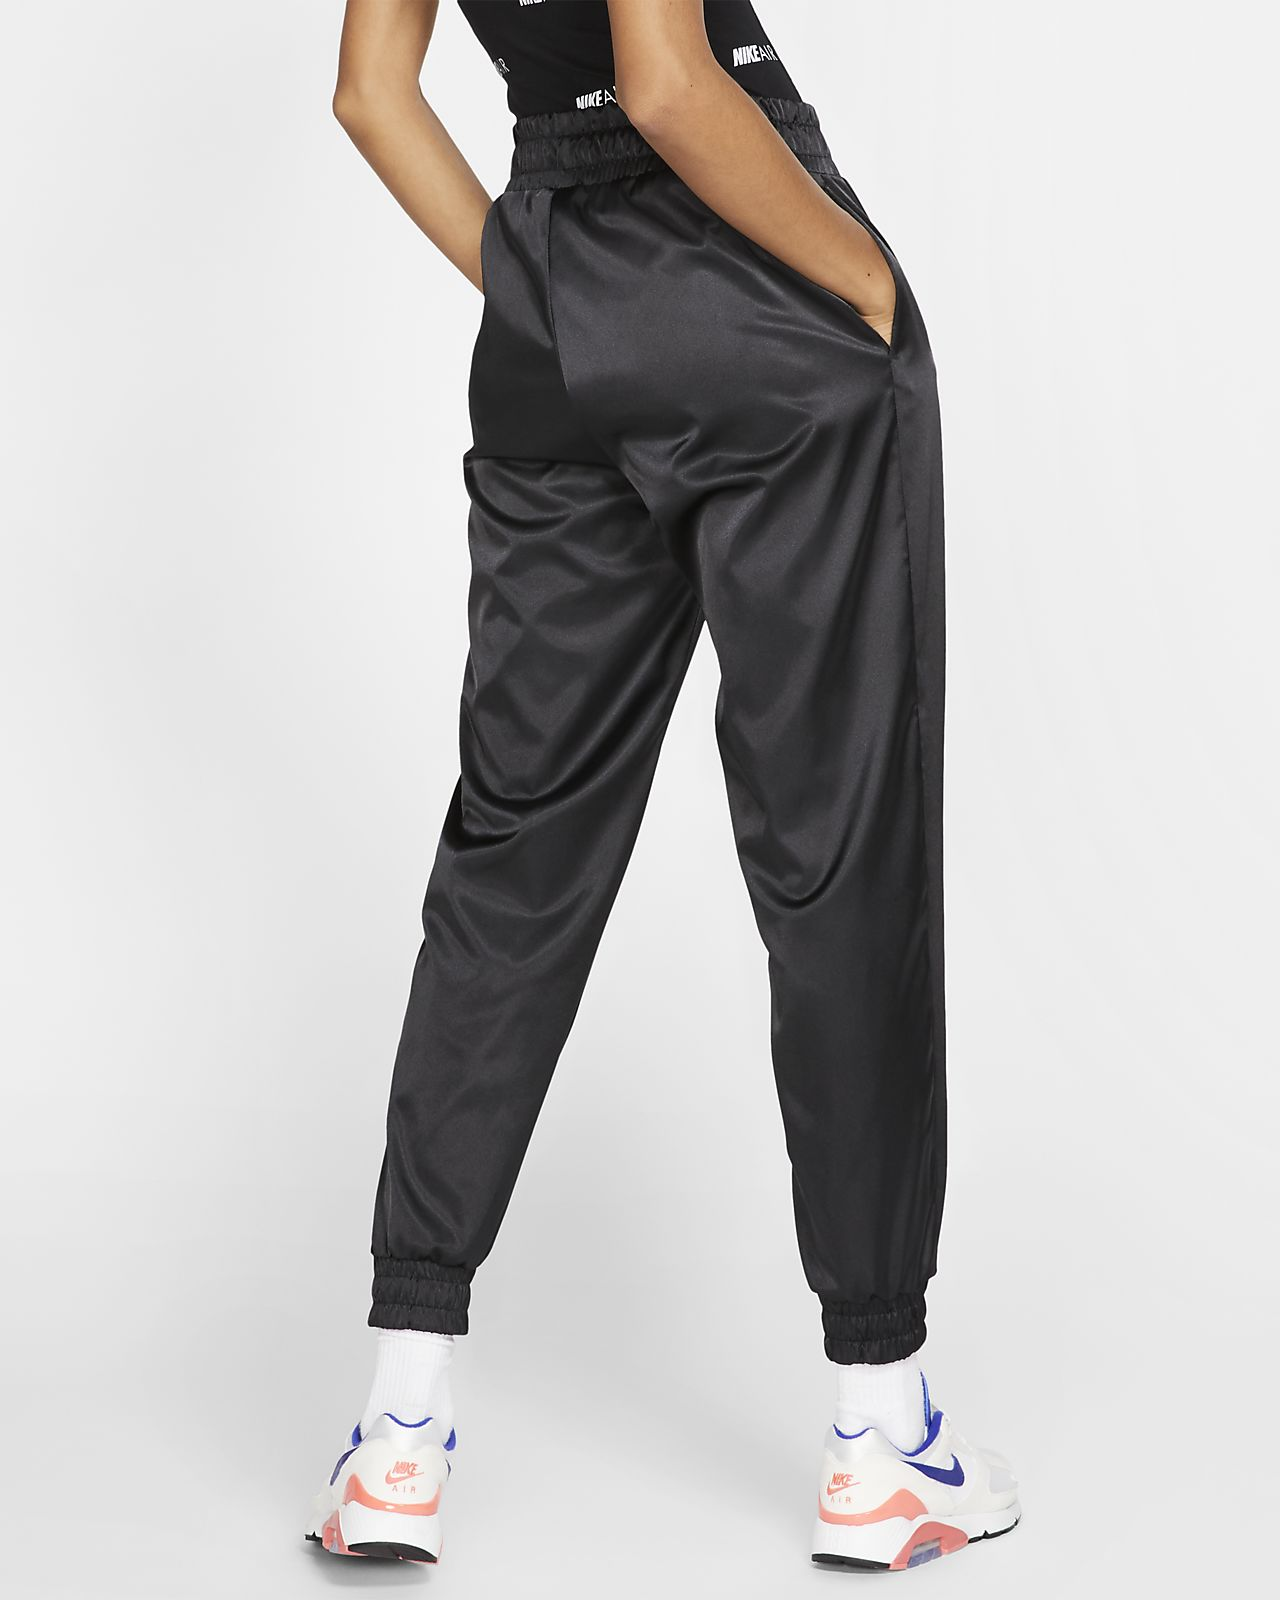 Nike Air Women's Satin Tracksuit Bottoms. Nike AT